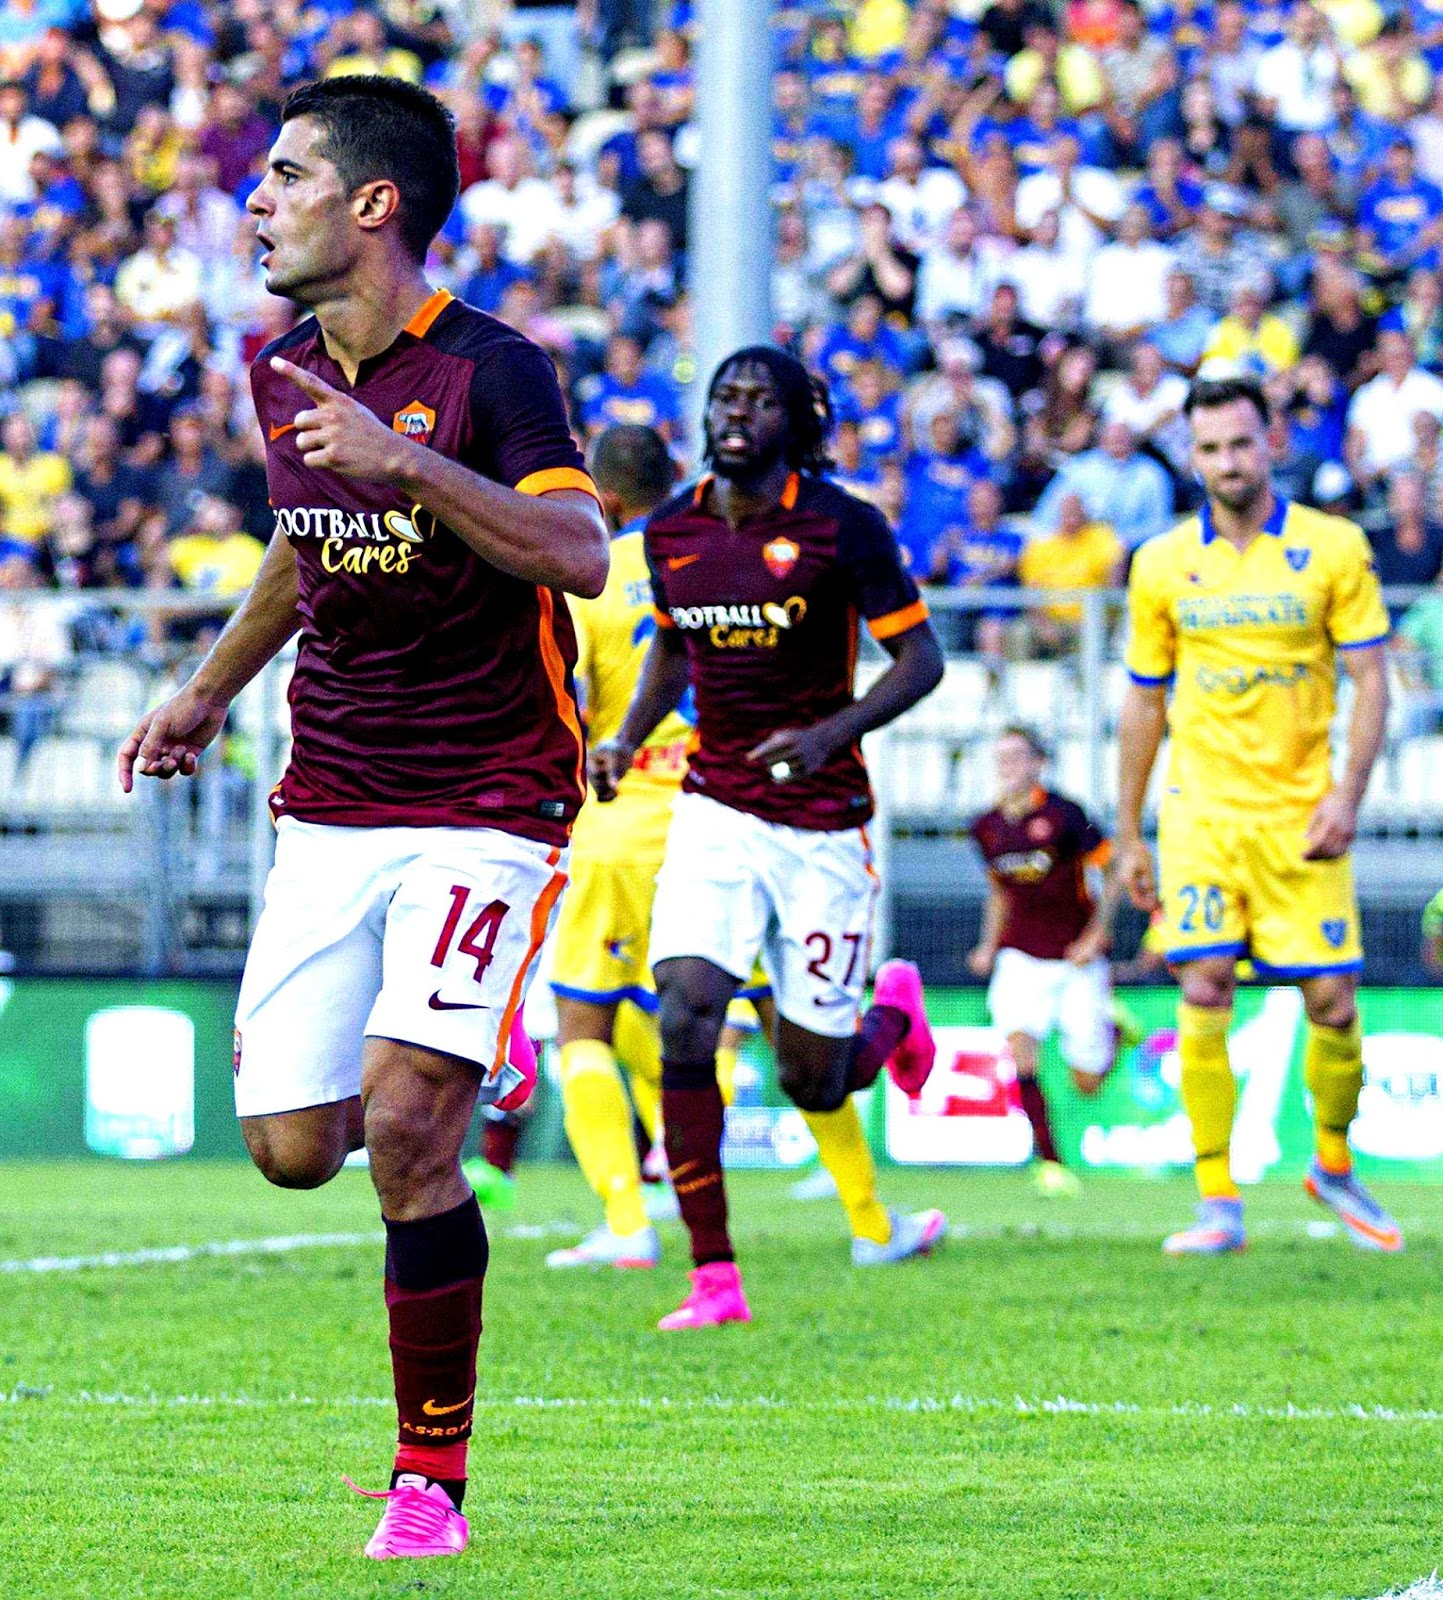 Champions League Roma Vs Barcelona: Hollywoodbets Sports Blog: UEFA Champions League: AS Roma